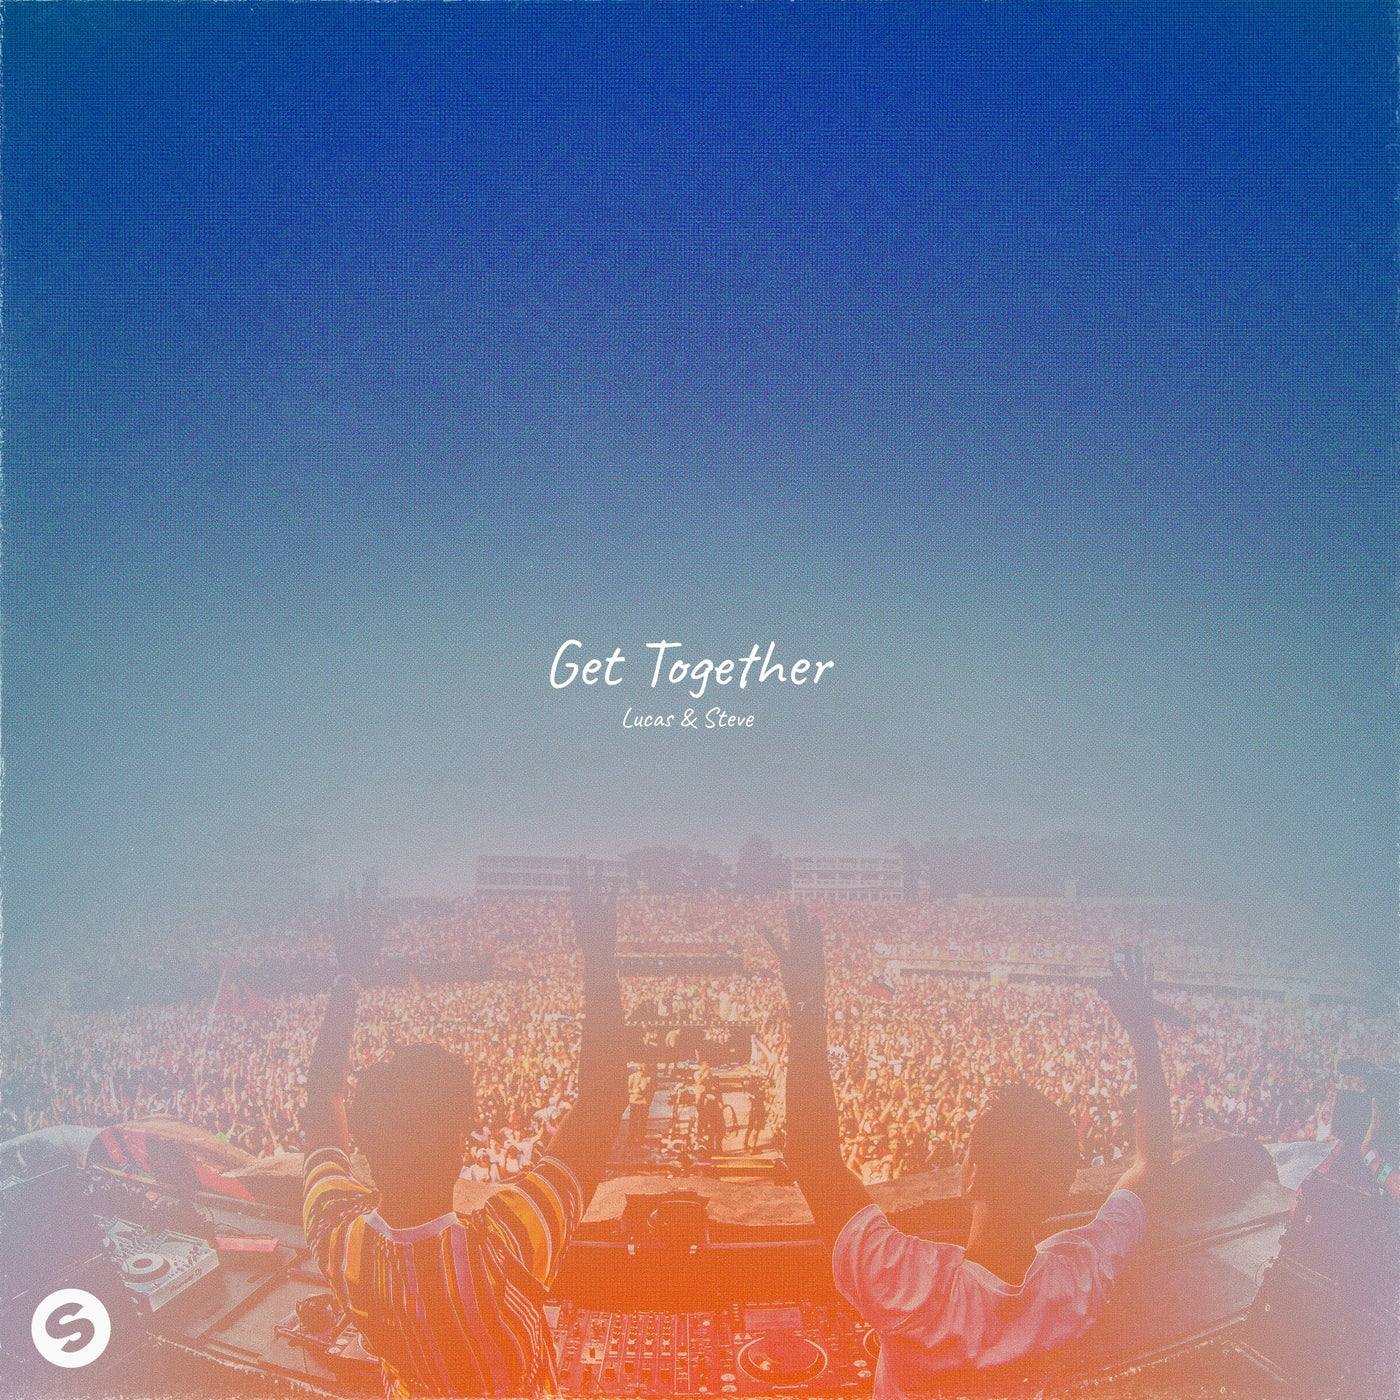 Get Together (Extended Mix)